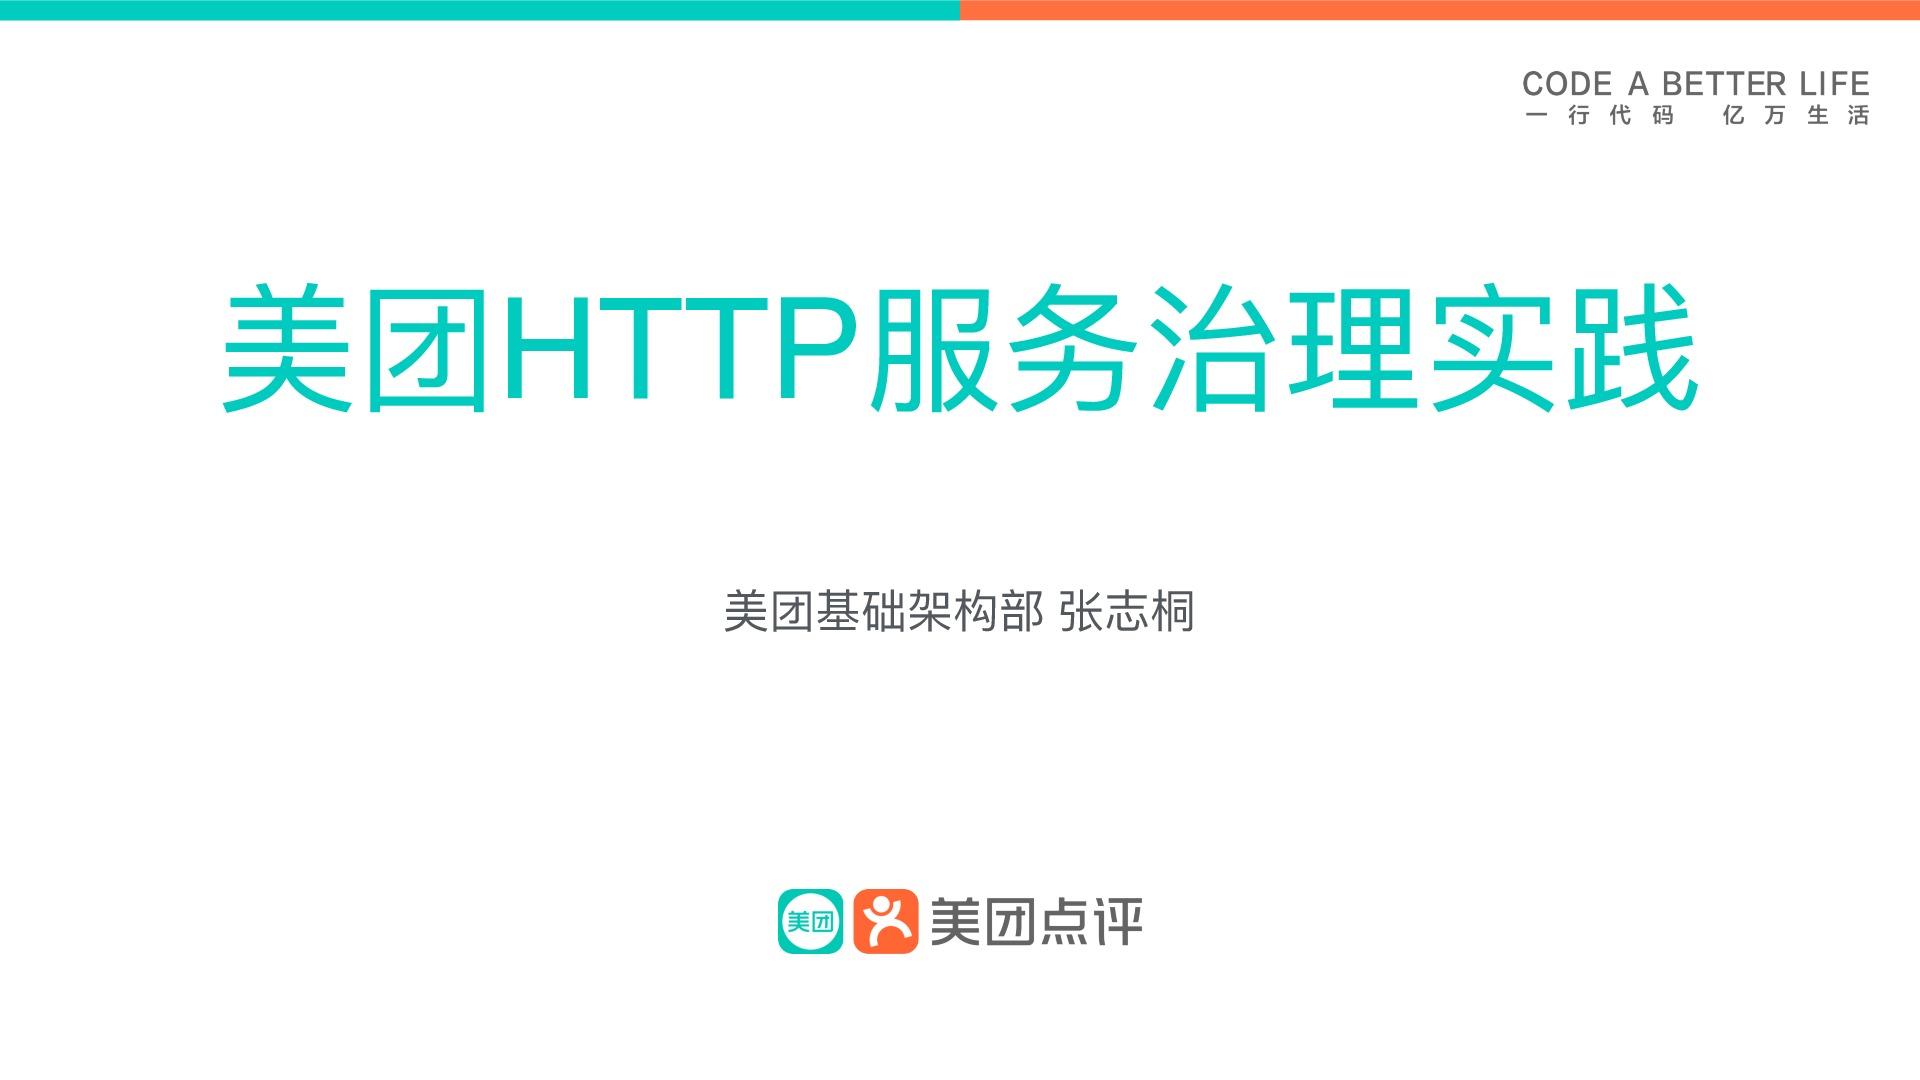 https://opentalk-blog.b0.upaiyun.com/prod/2019-07-07/4570c69d66991d4f8bd482391b99bfb1